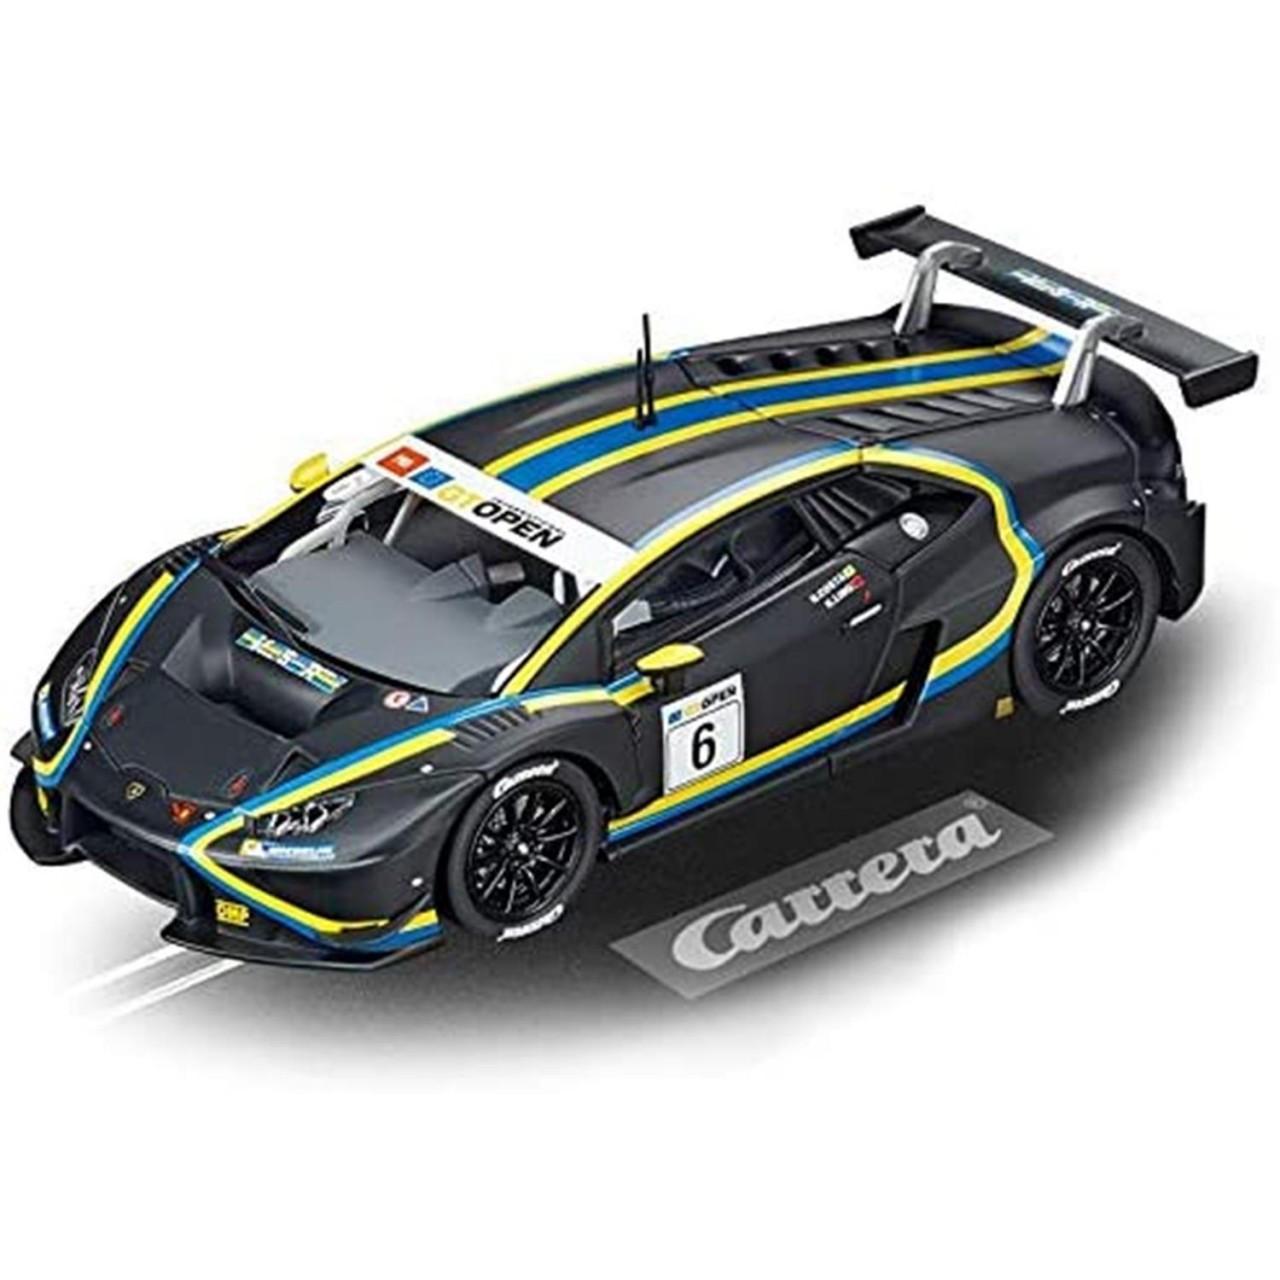 Carrera Digital 132 20030007 GT Triple Power